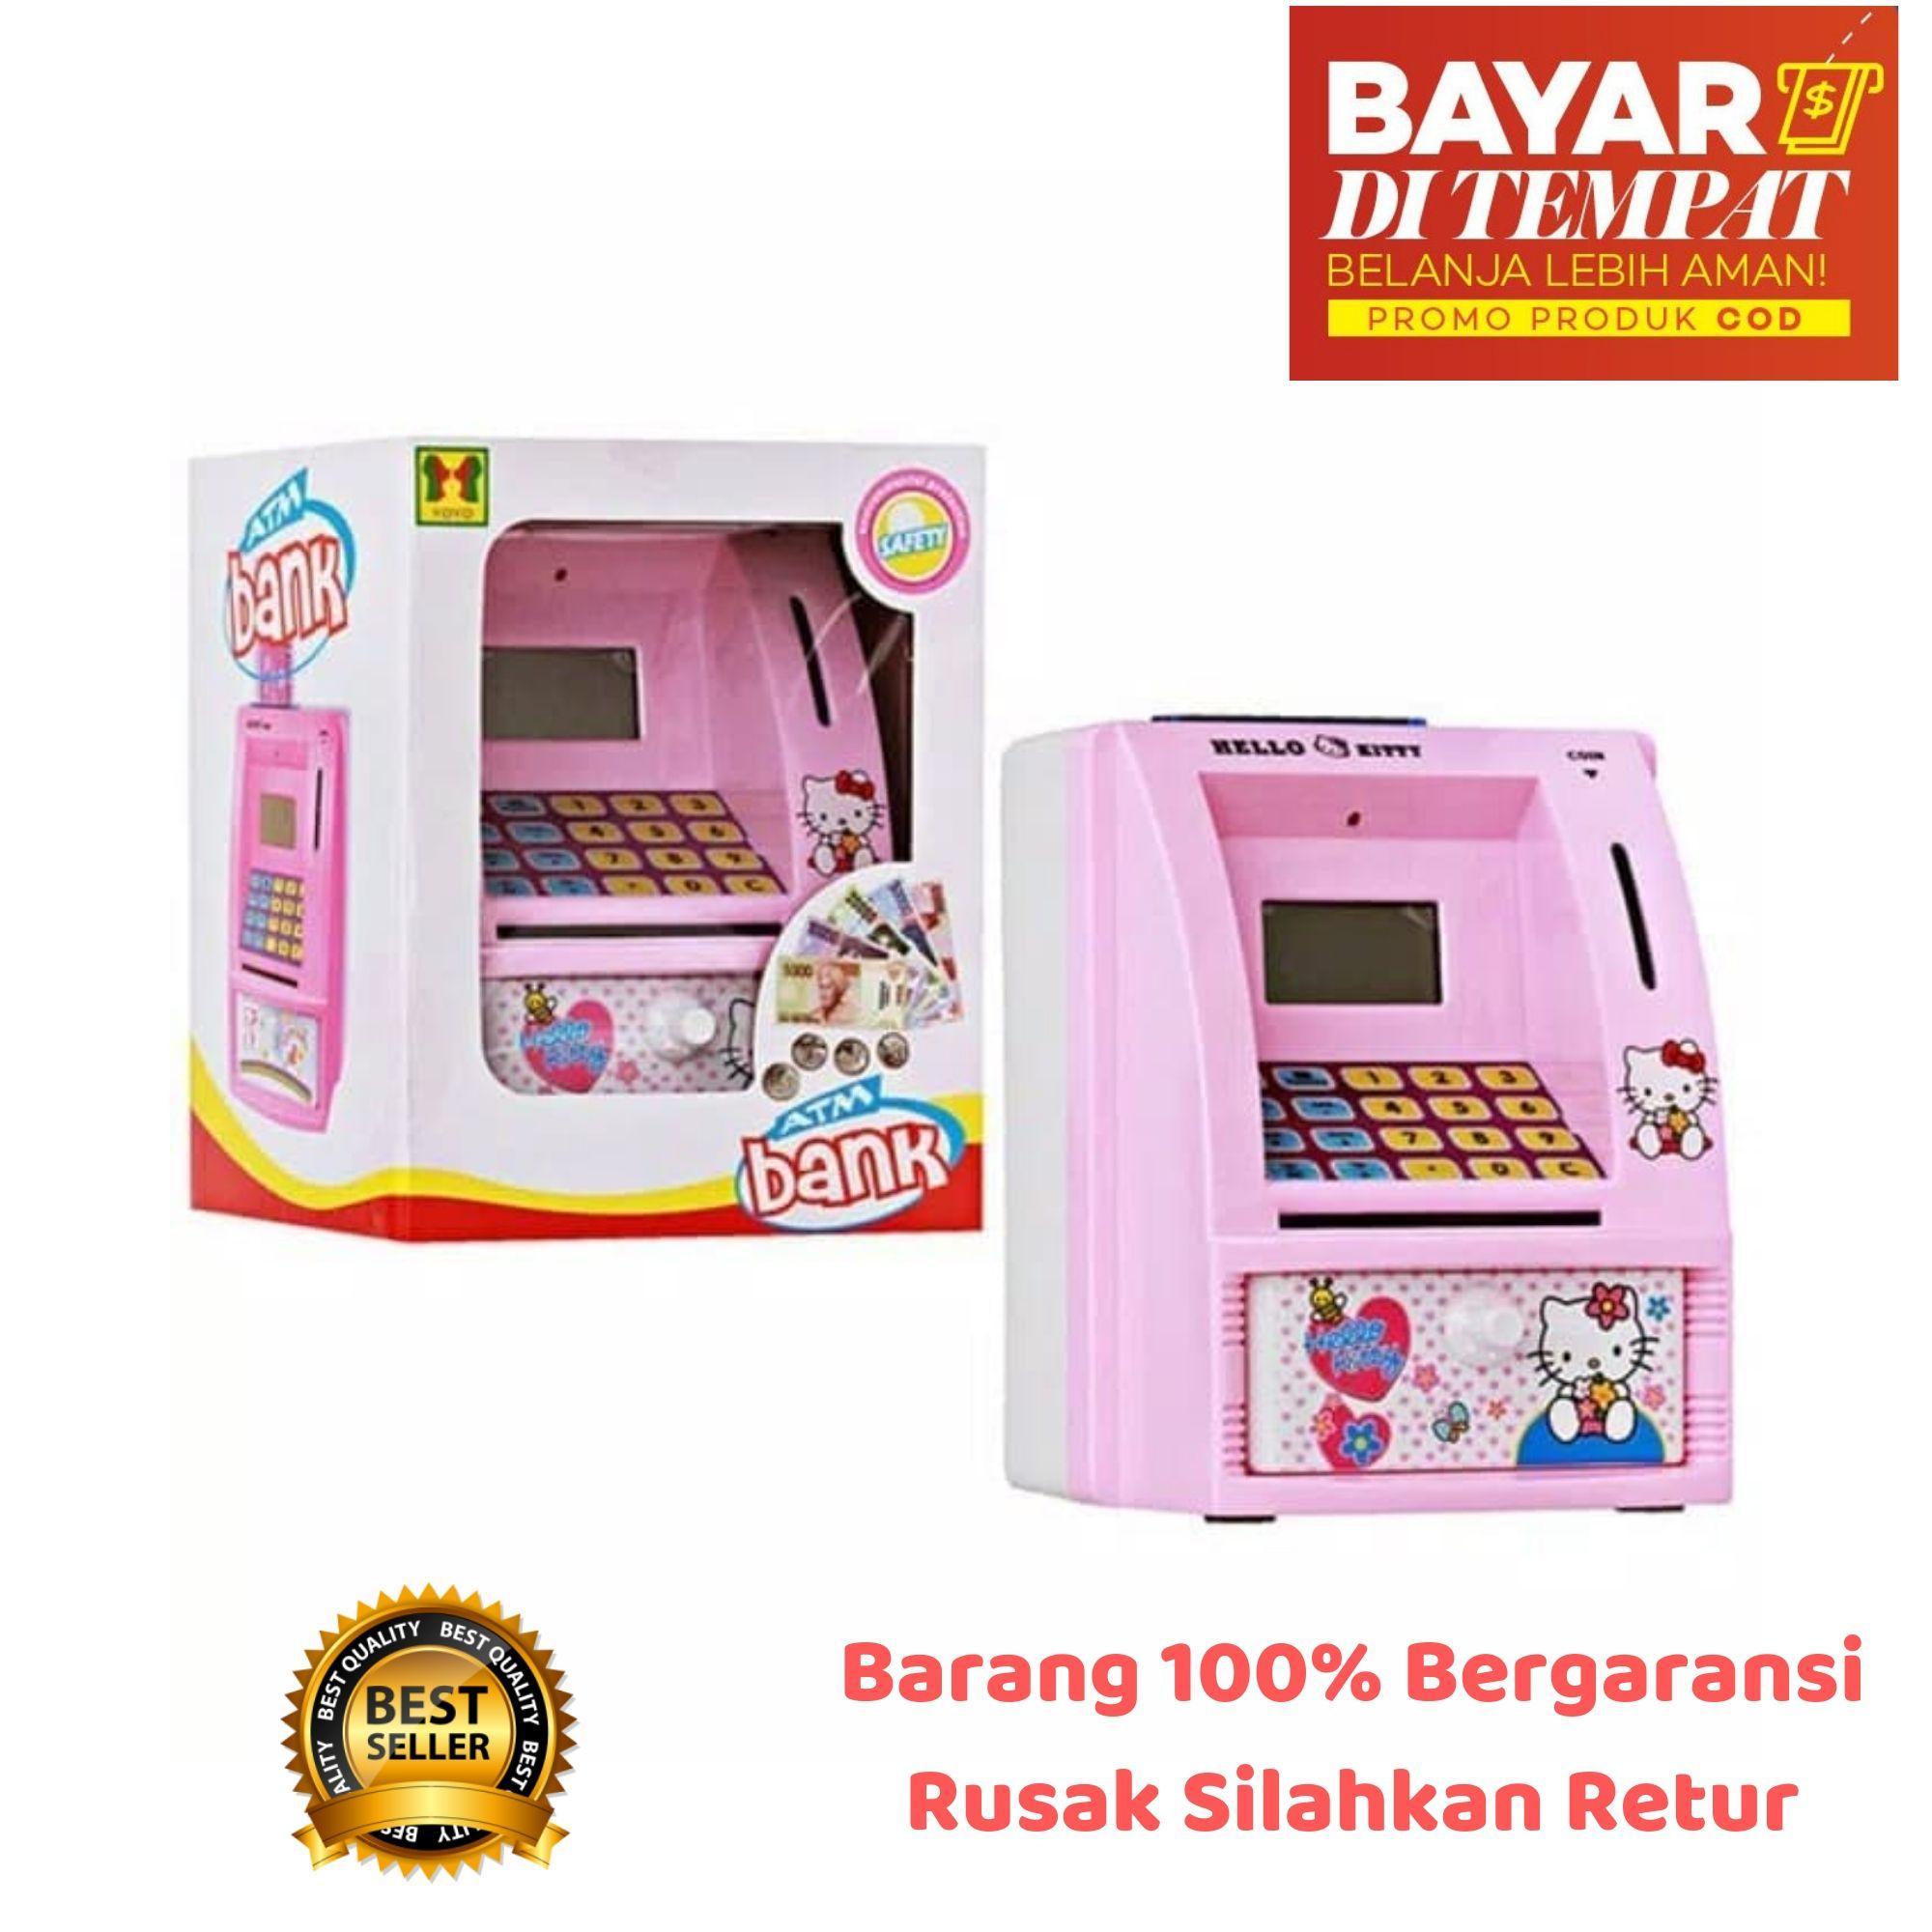 Agenmainan Mainan Anak Celengan ATM Mini Bank Menabung Mesin Hitung Saldo Uang Bahasa Indonesia / mainan anak / mainan edukasi / mainan edukatif / mainan perempuan / mainan cewek / mainan cowok / mainan laki laki / mainan atm / mainan uang